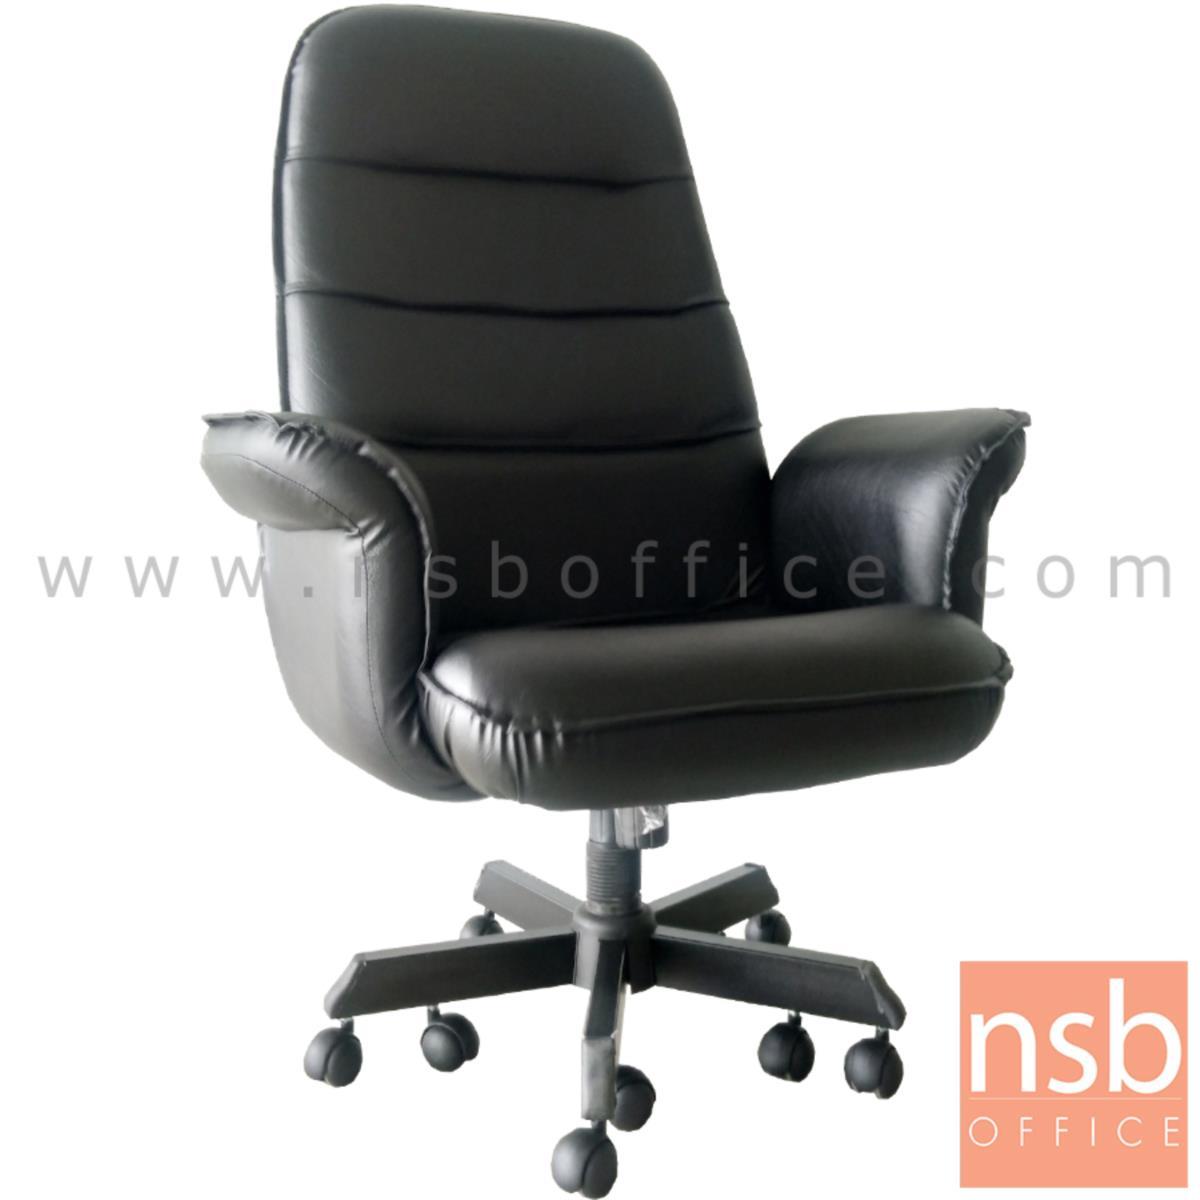 B14A004:เก้าอี้ผู้บริหาร รุ่น Marazzo (มารัซโซ่)  มีก้อนโยก ขาเหล็ก 10 ล้อ